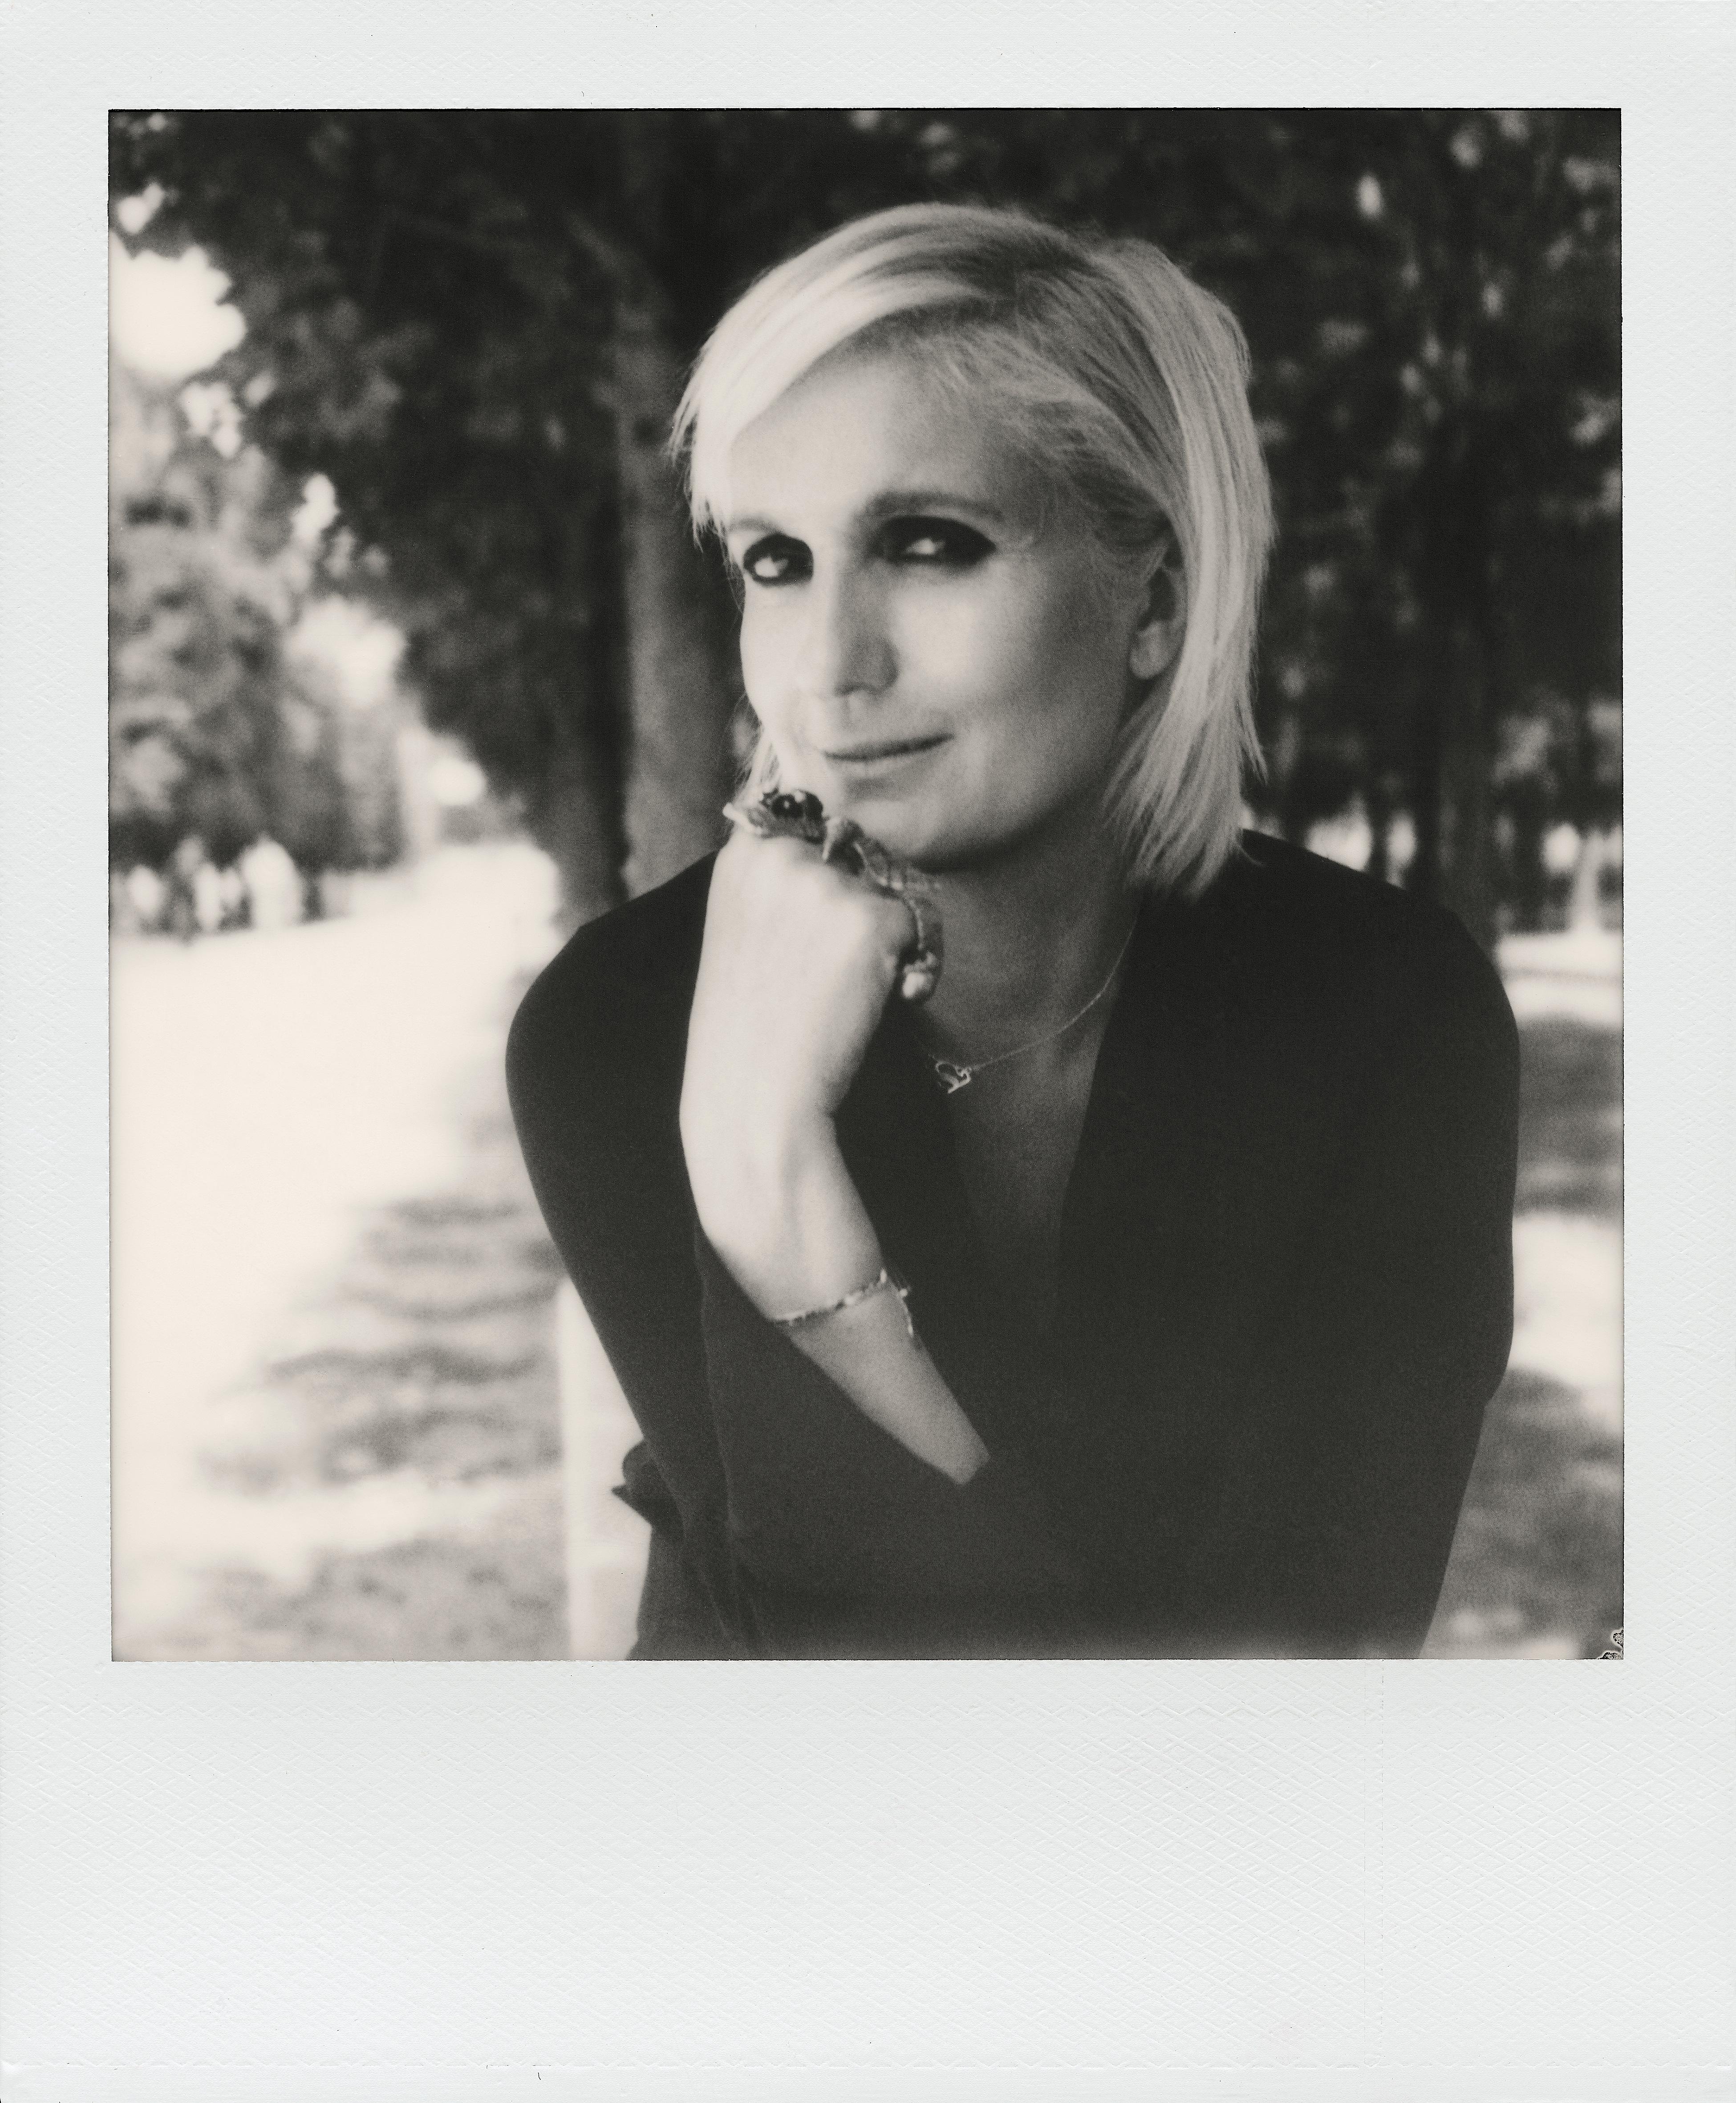 MARIA GRAZIA CHIURI NAMED ARTISTIC DIRECTOR OF CHRISTIAN DIOR